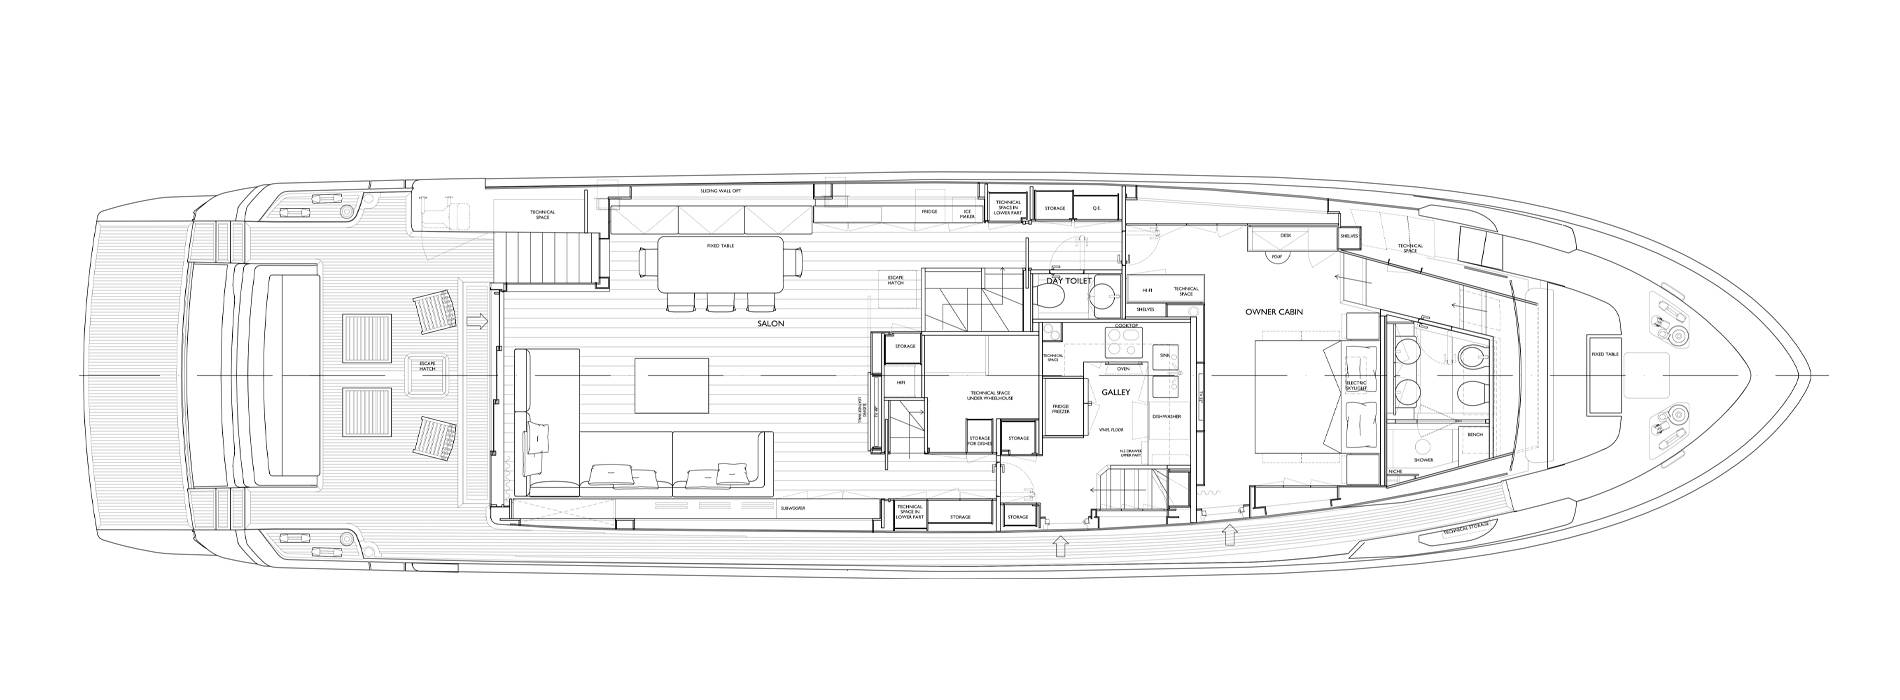 Sanlorenzo Yachts SL90 Asymmetric Главная палуба